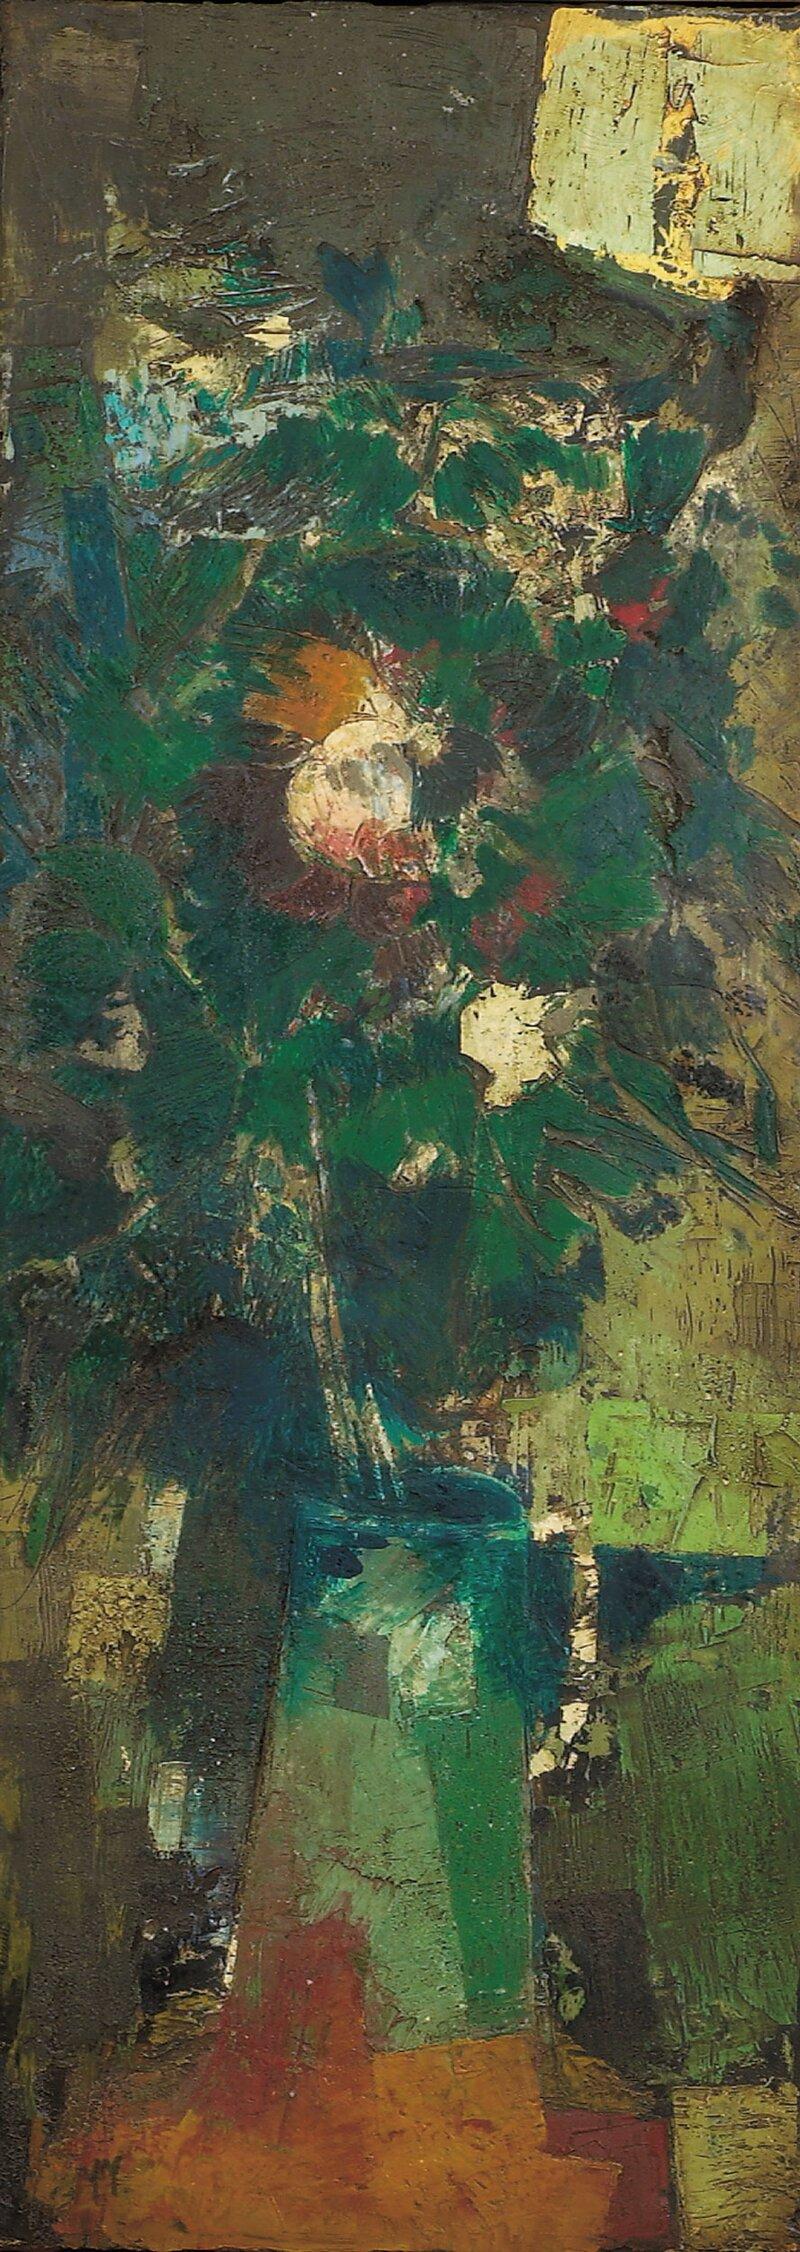 Blomster i kanne